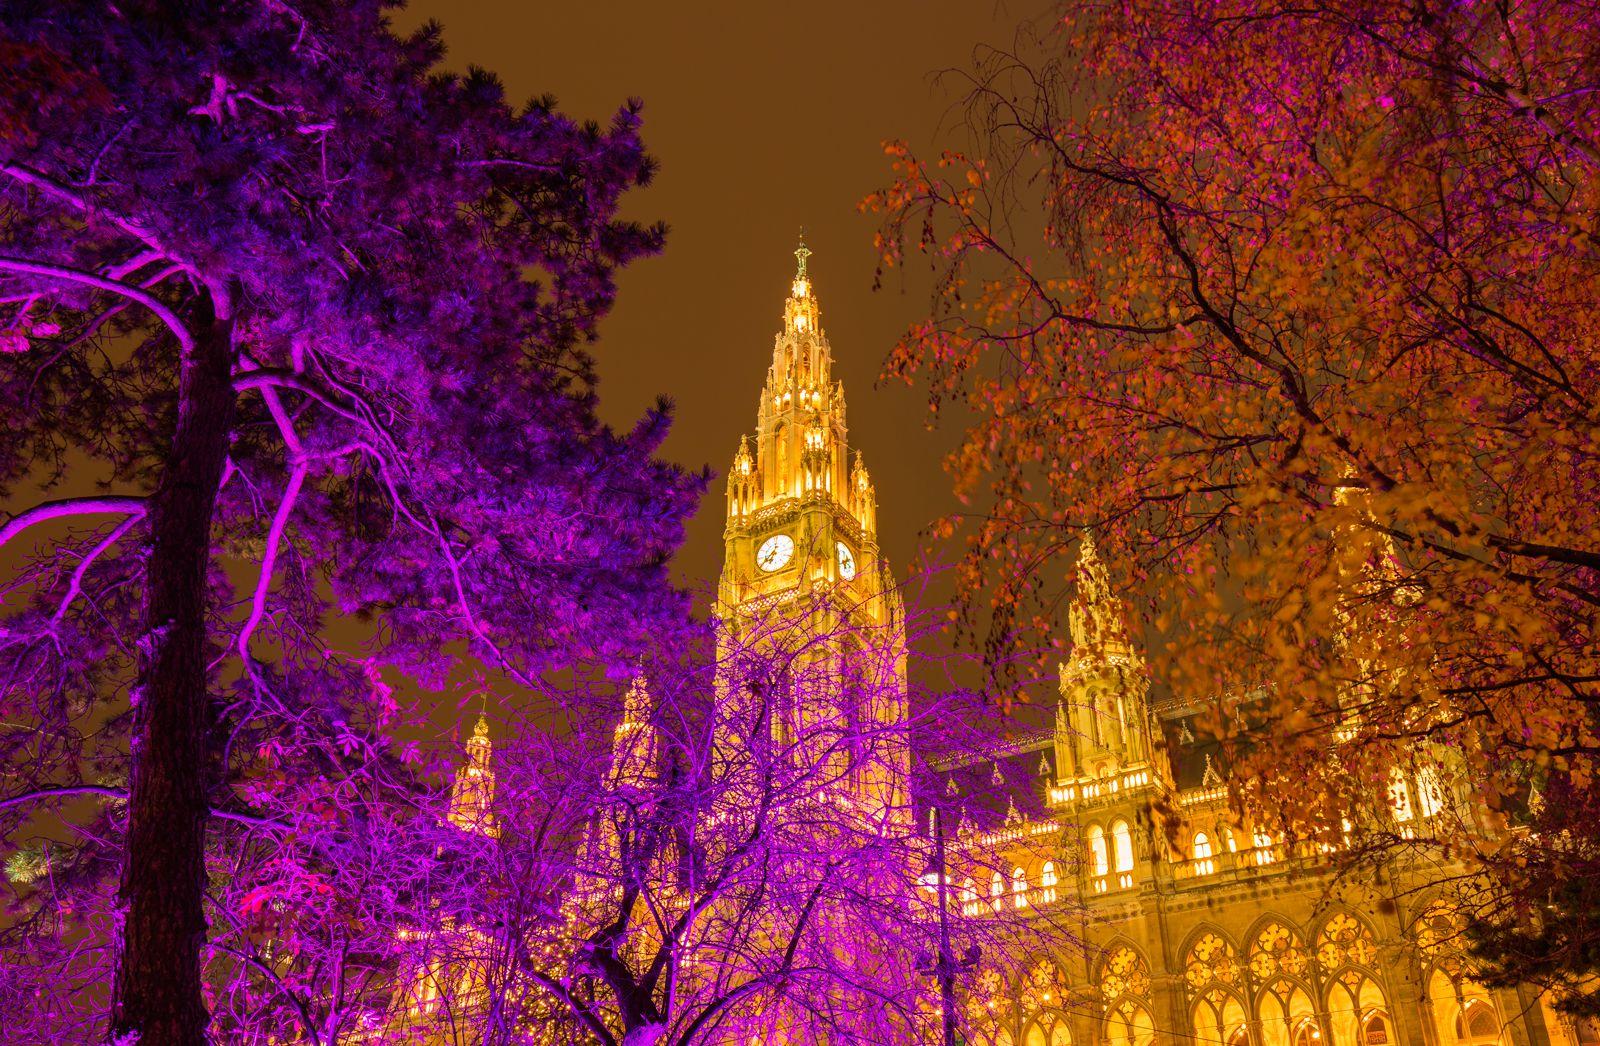 2021/01/Advent-Budimpešta-6.jpg